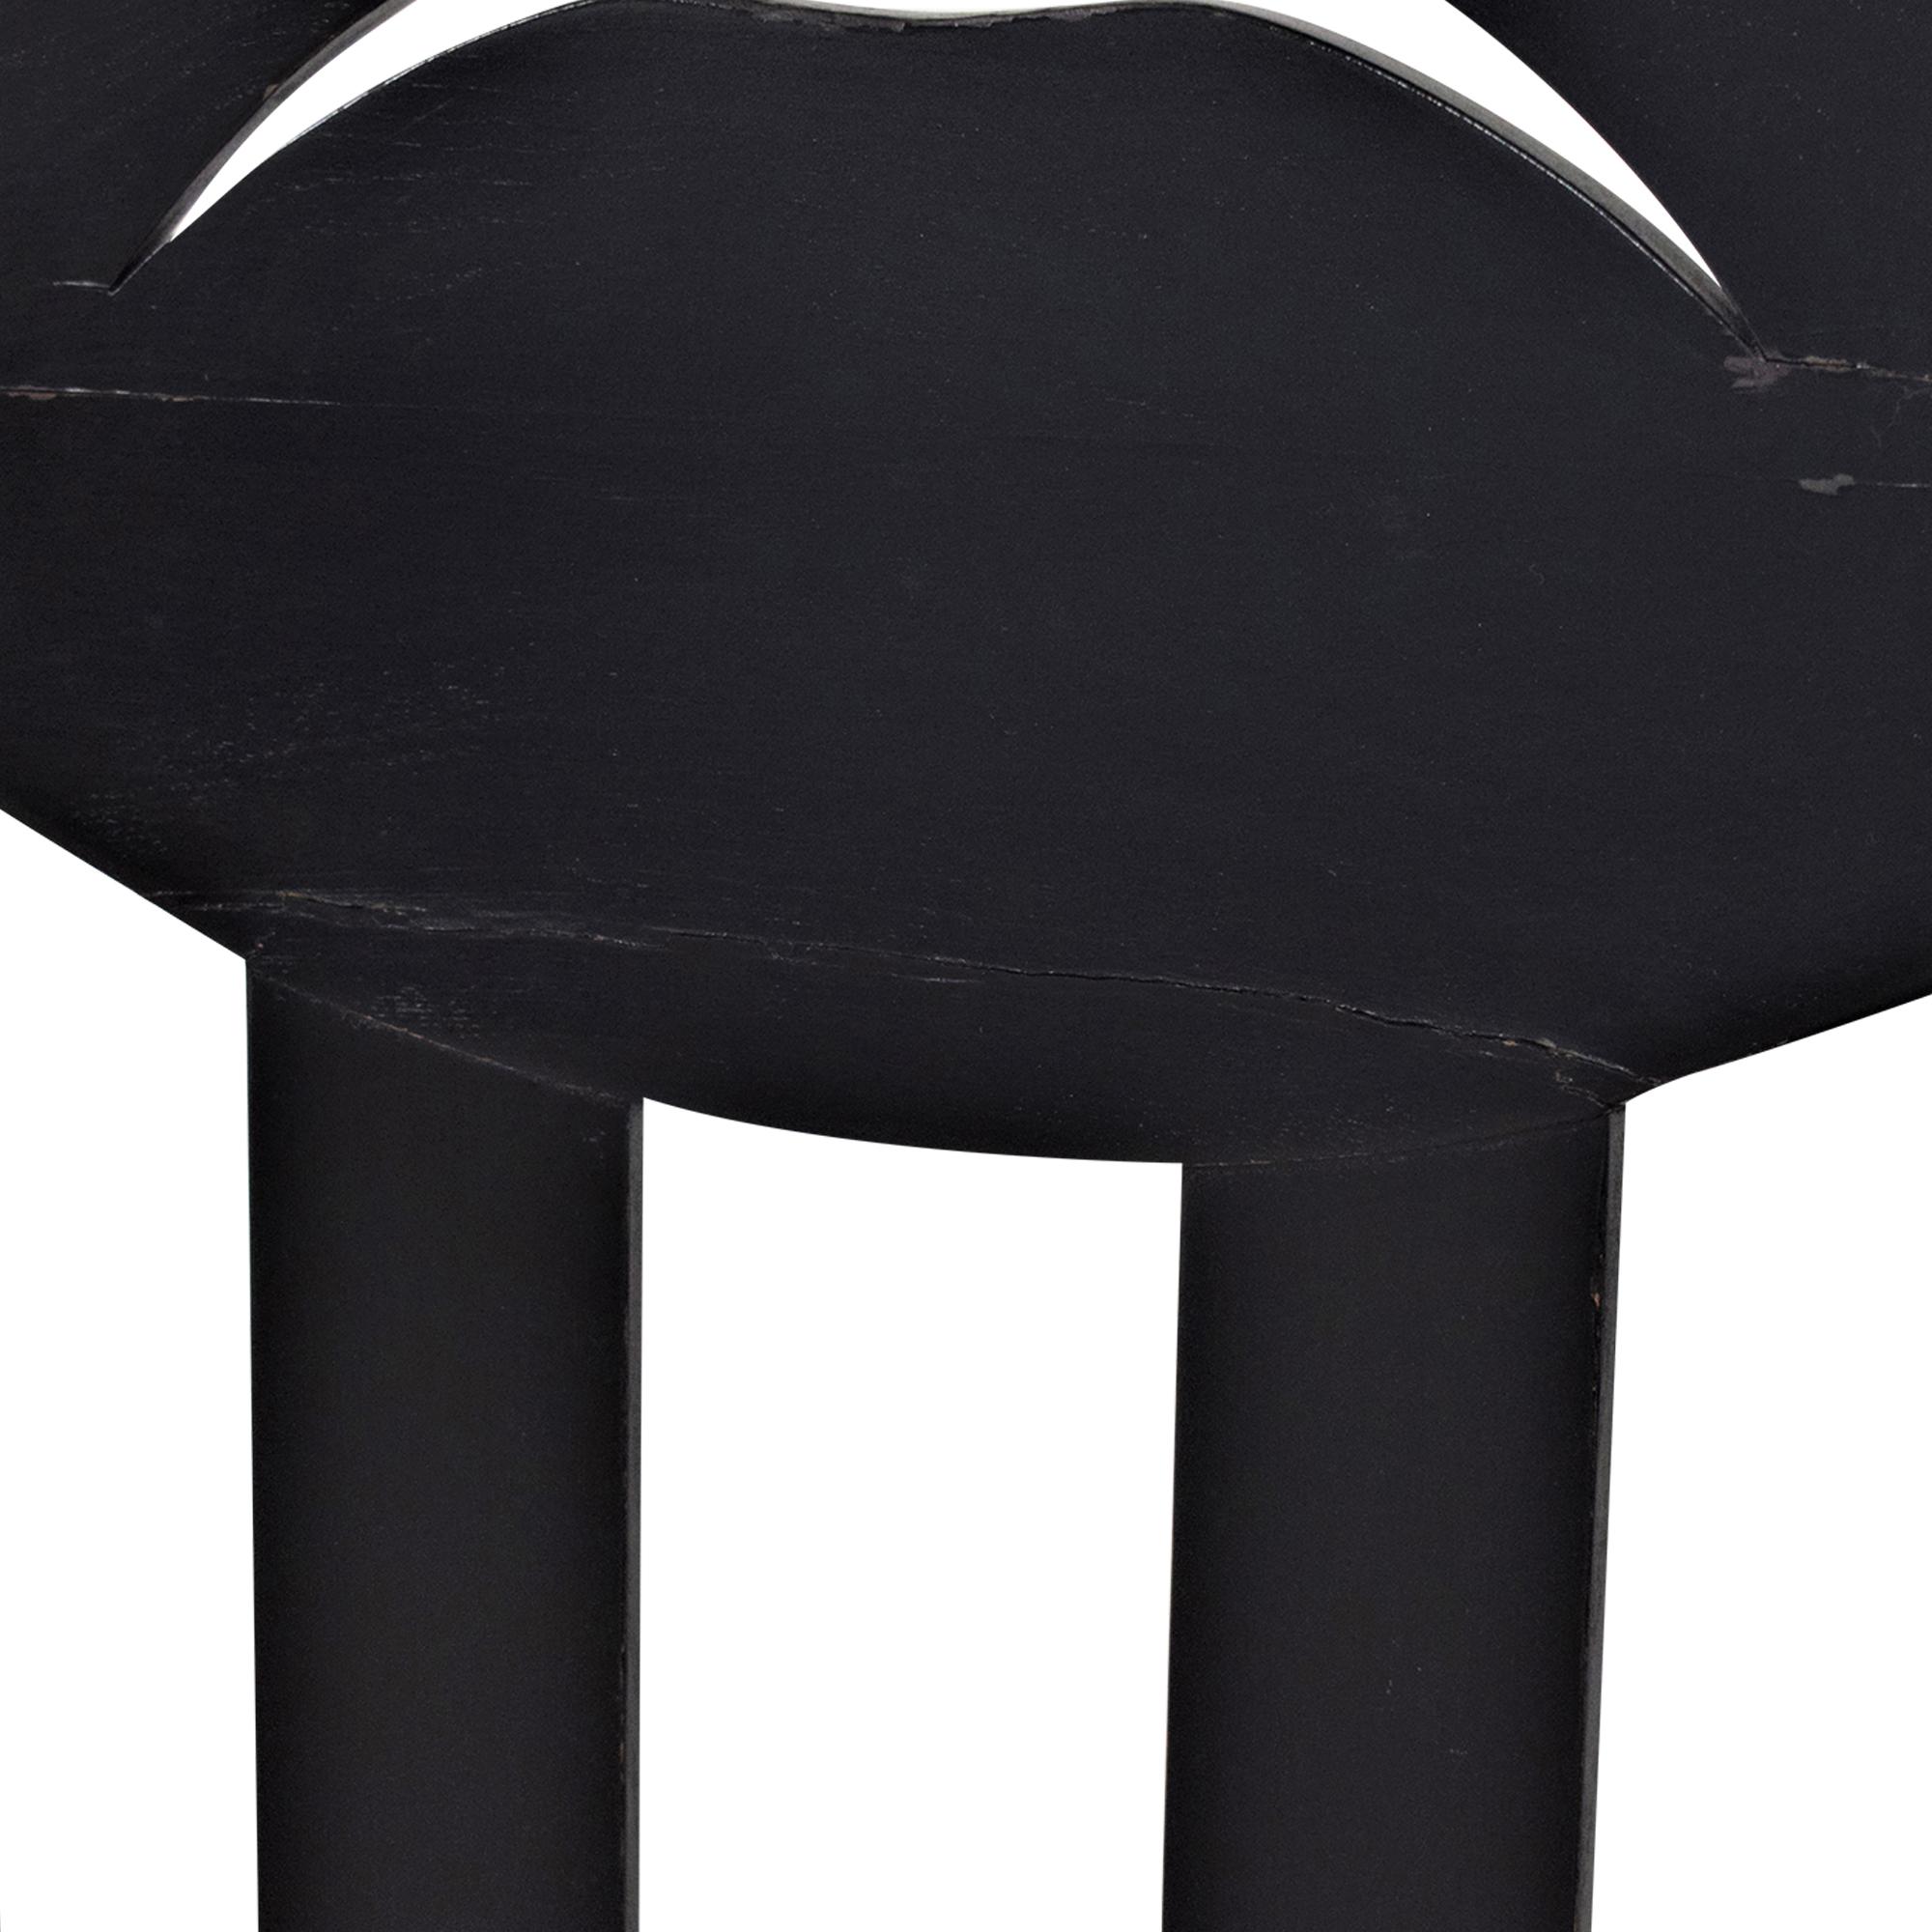 Cassina Mackintosh Argyle Chair / Chairs